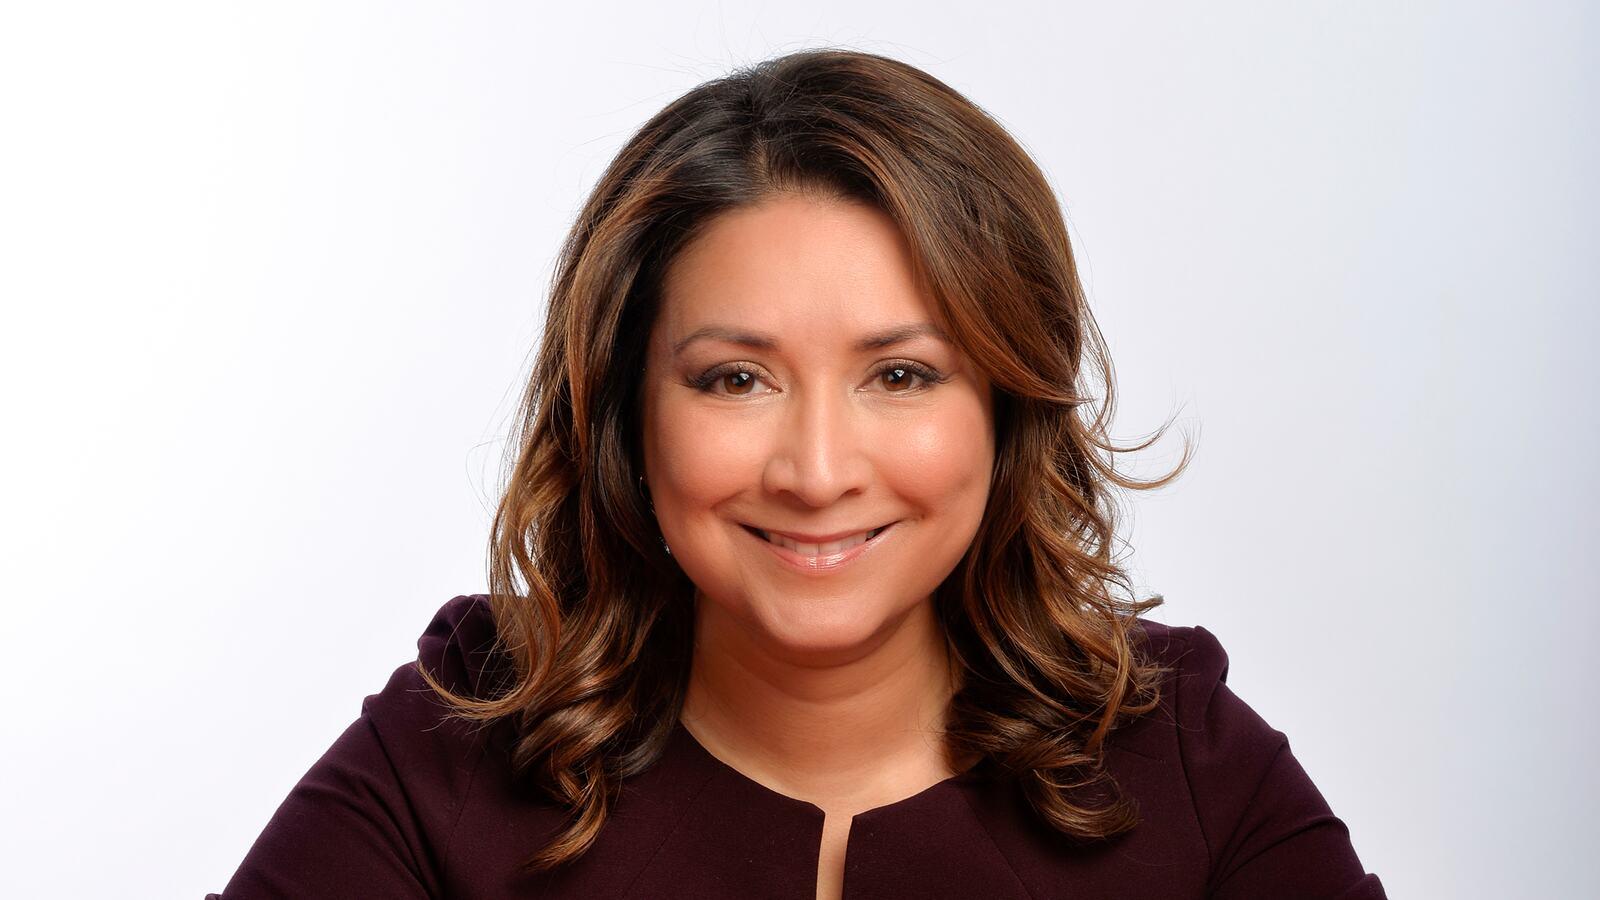 Ayesha Hazarika, comedian, broadcaster, political commentator